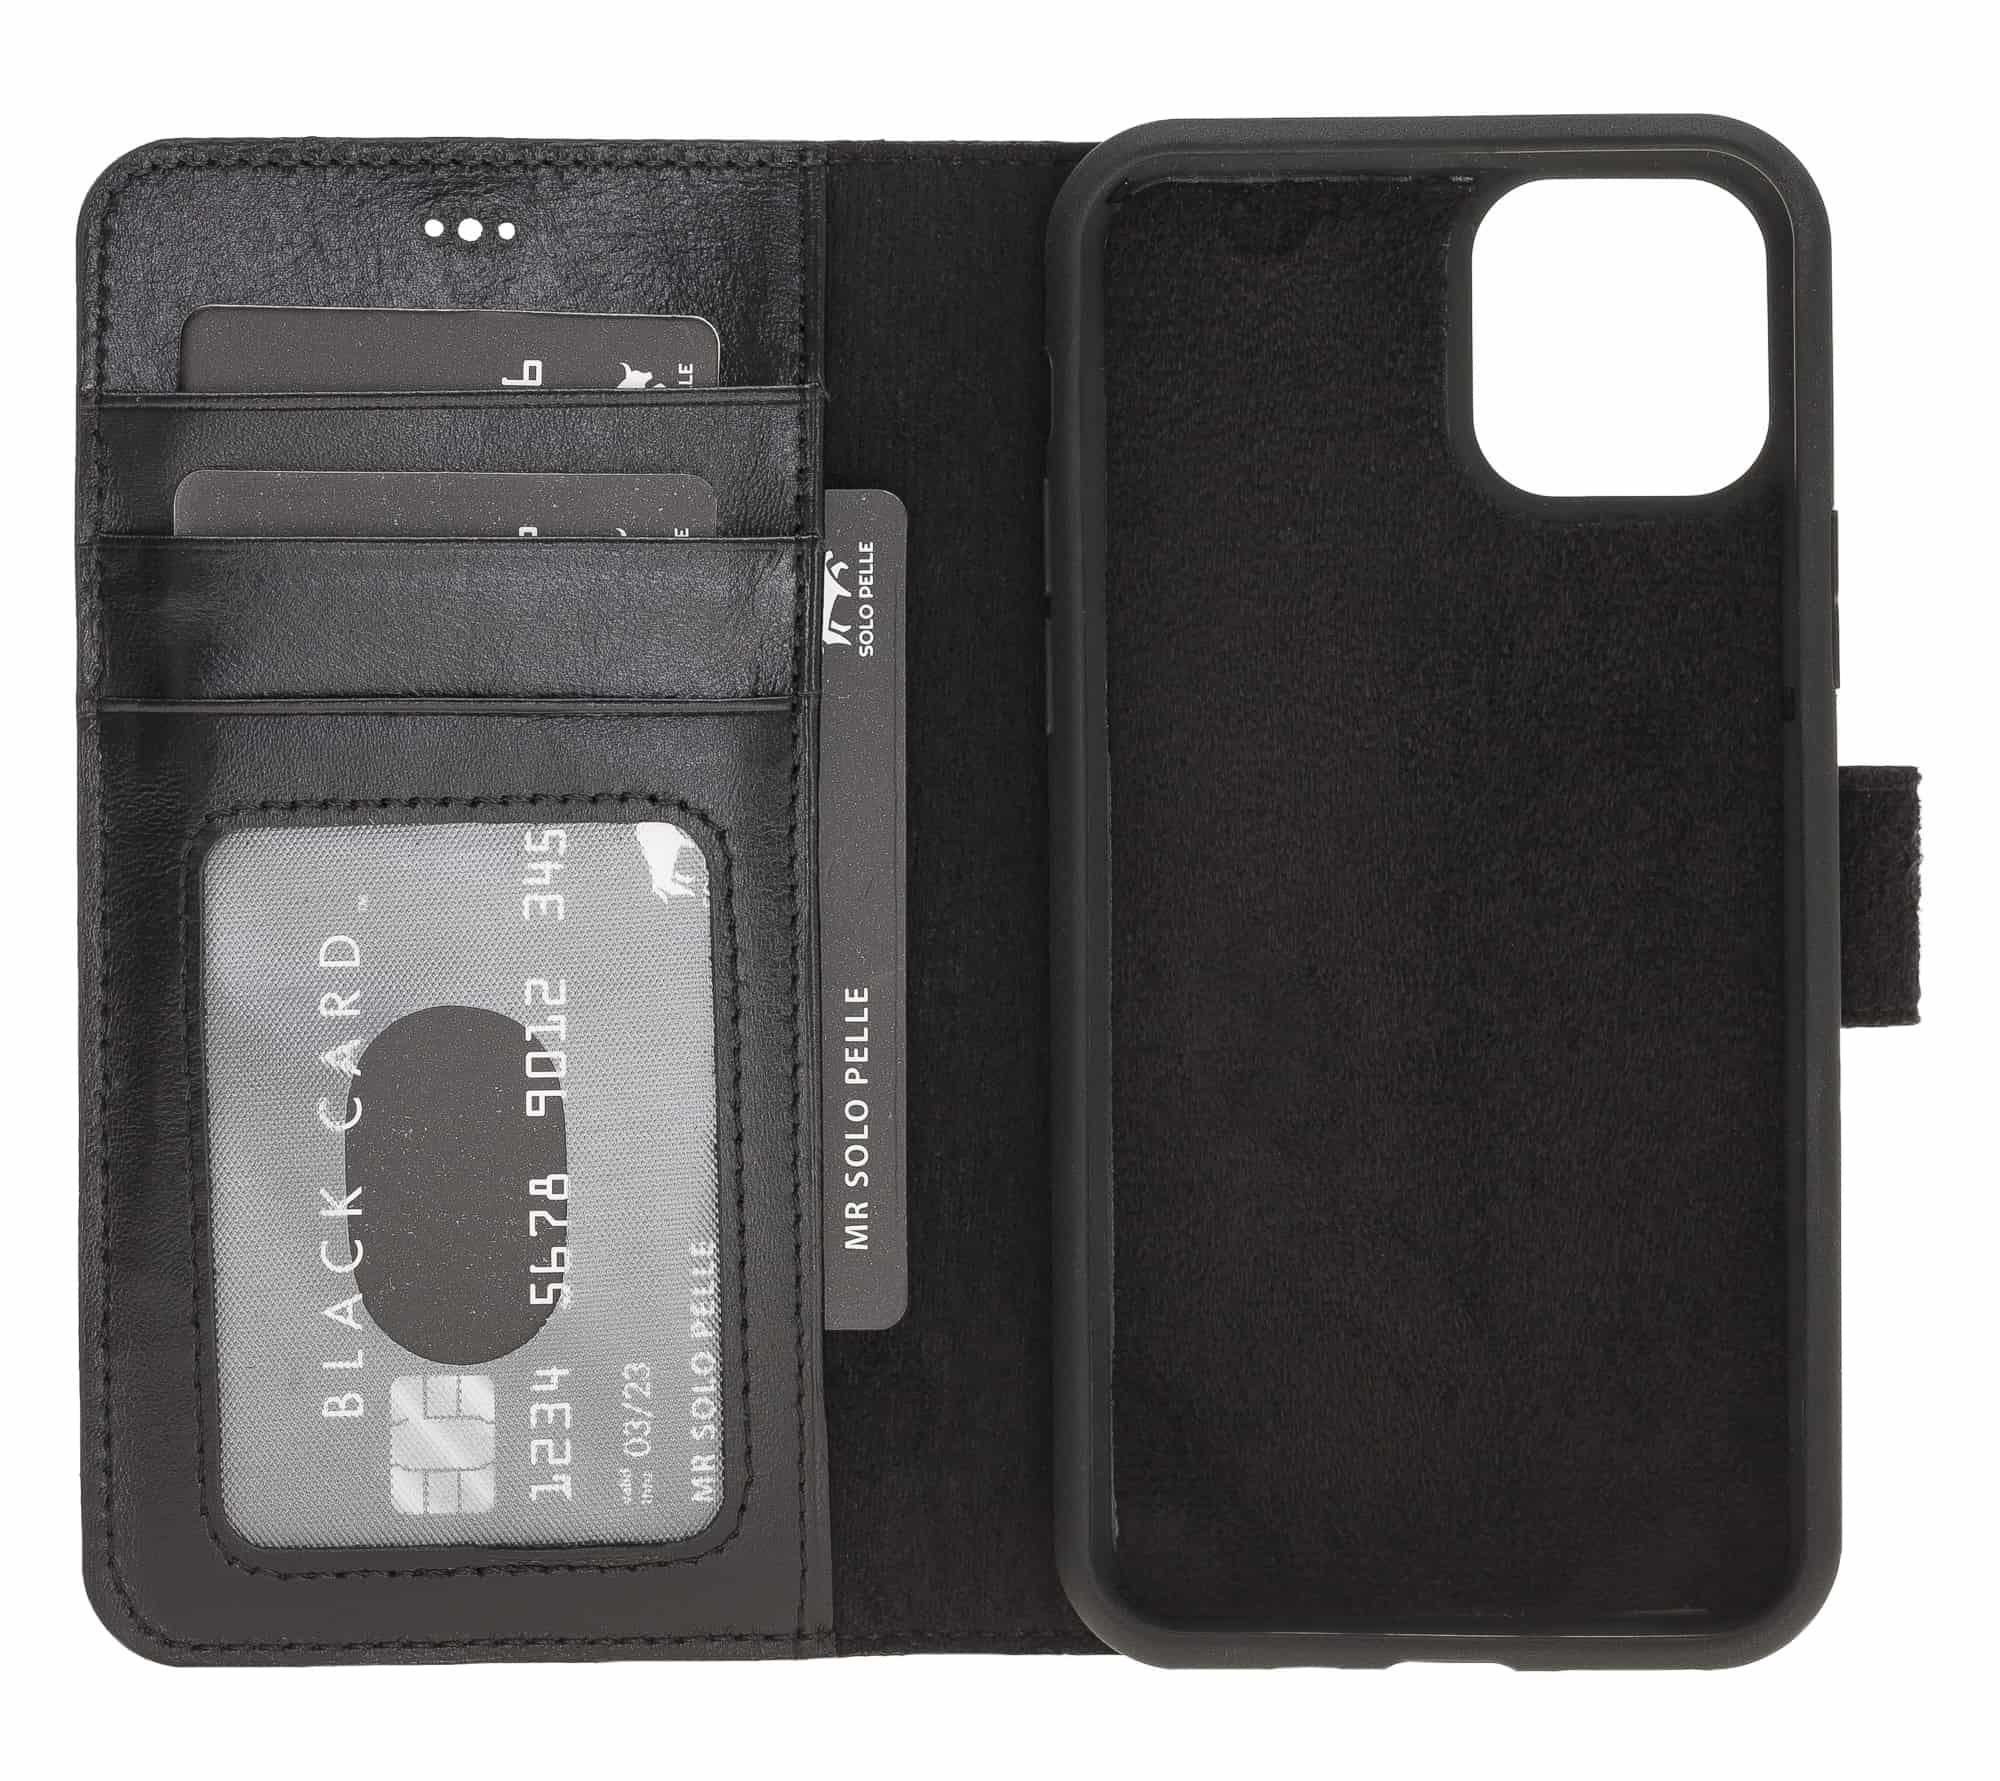 Solo Pelle Lederhülle kompatibel für iPhone 11 Pro Max 6.5 Zoll abnehmbare Hülle (2in1) inkl. Kartenfächer für das original Apple iPhone 11 Pro Max (Schwarz)